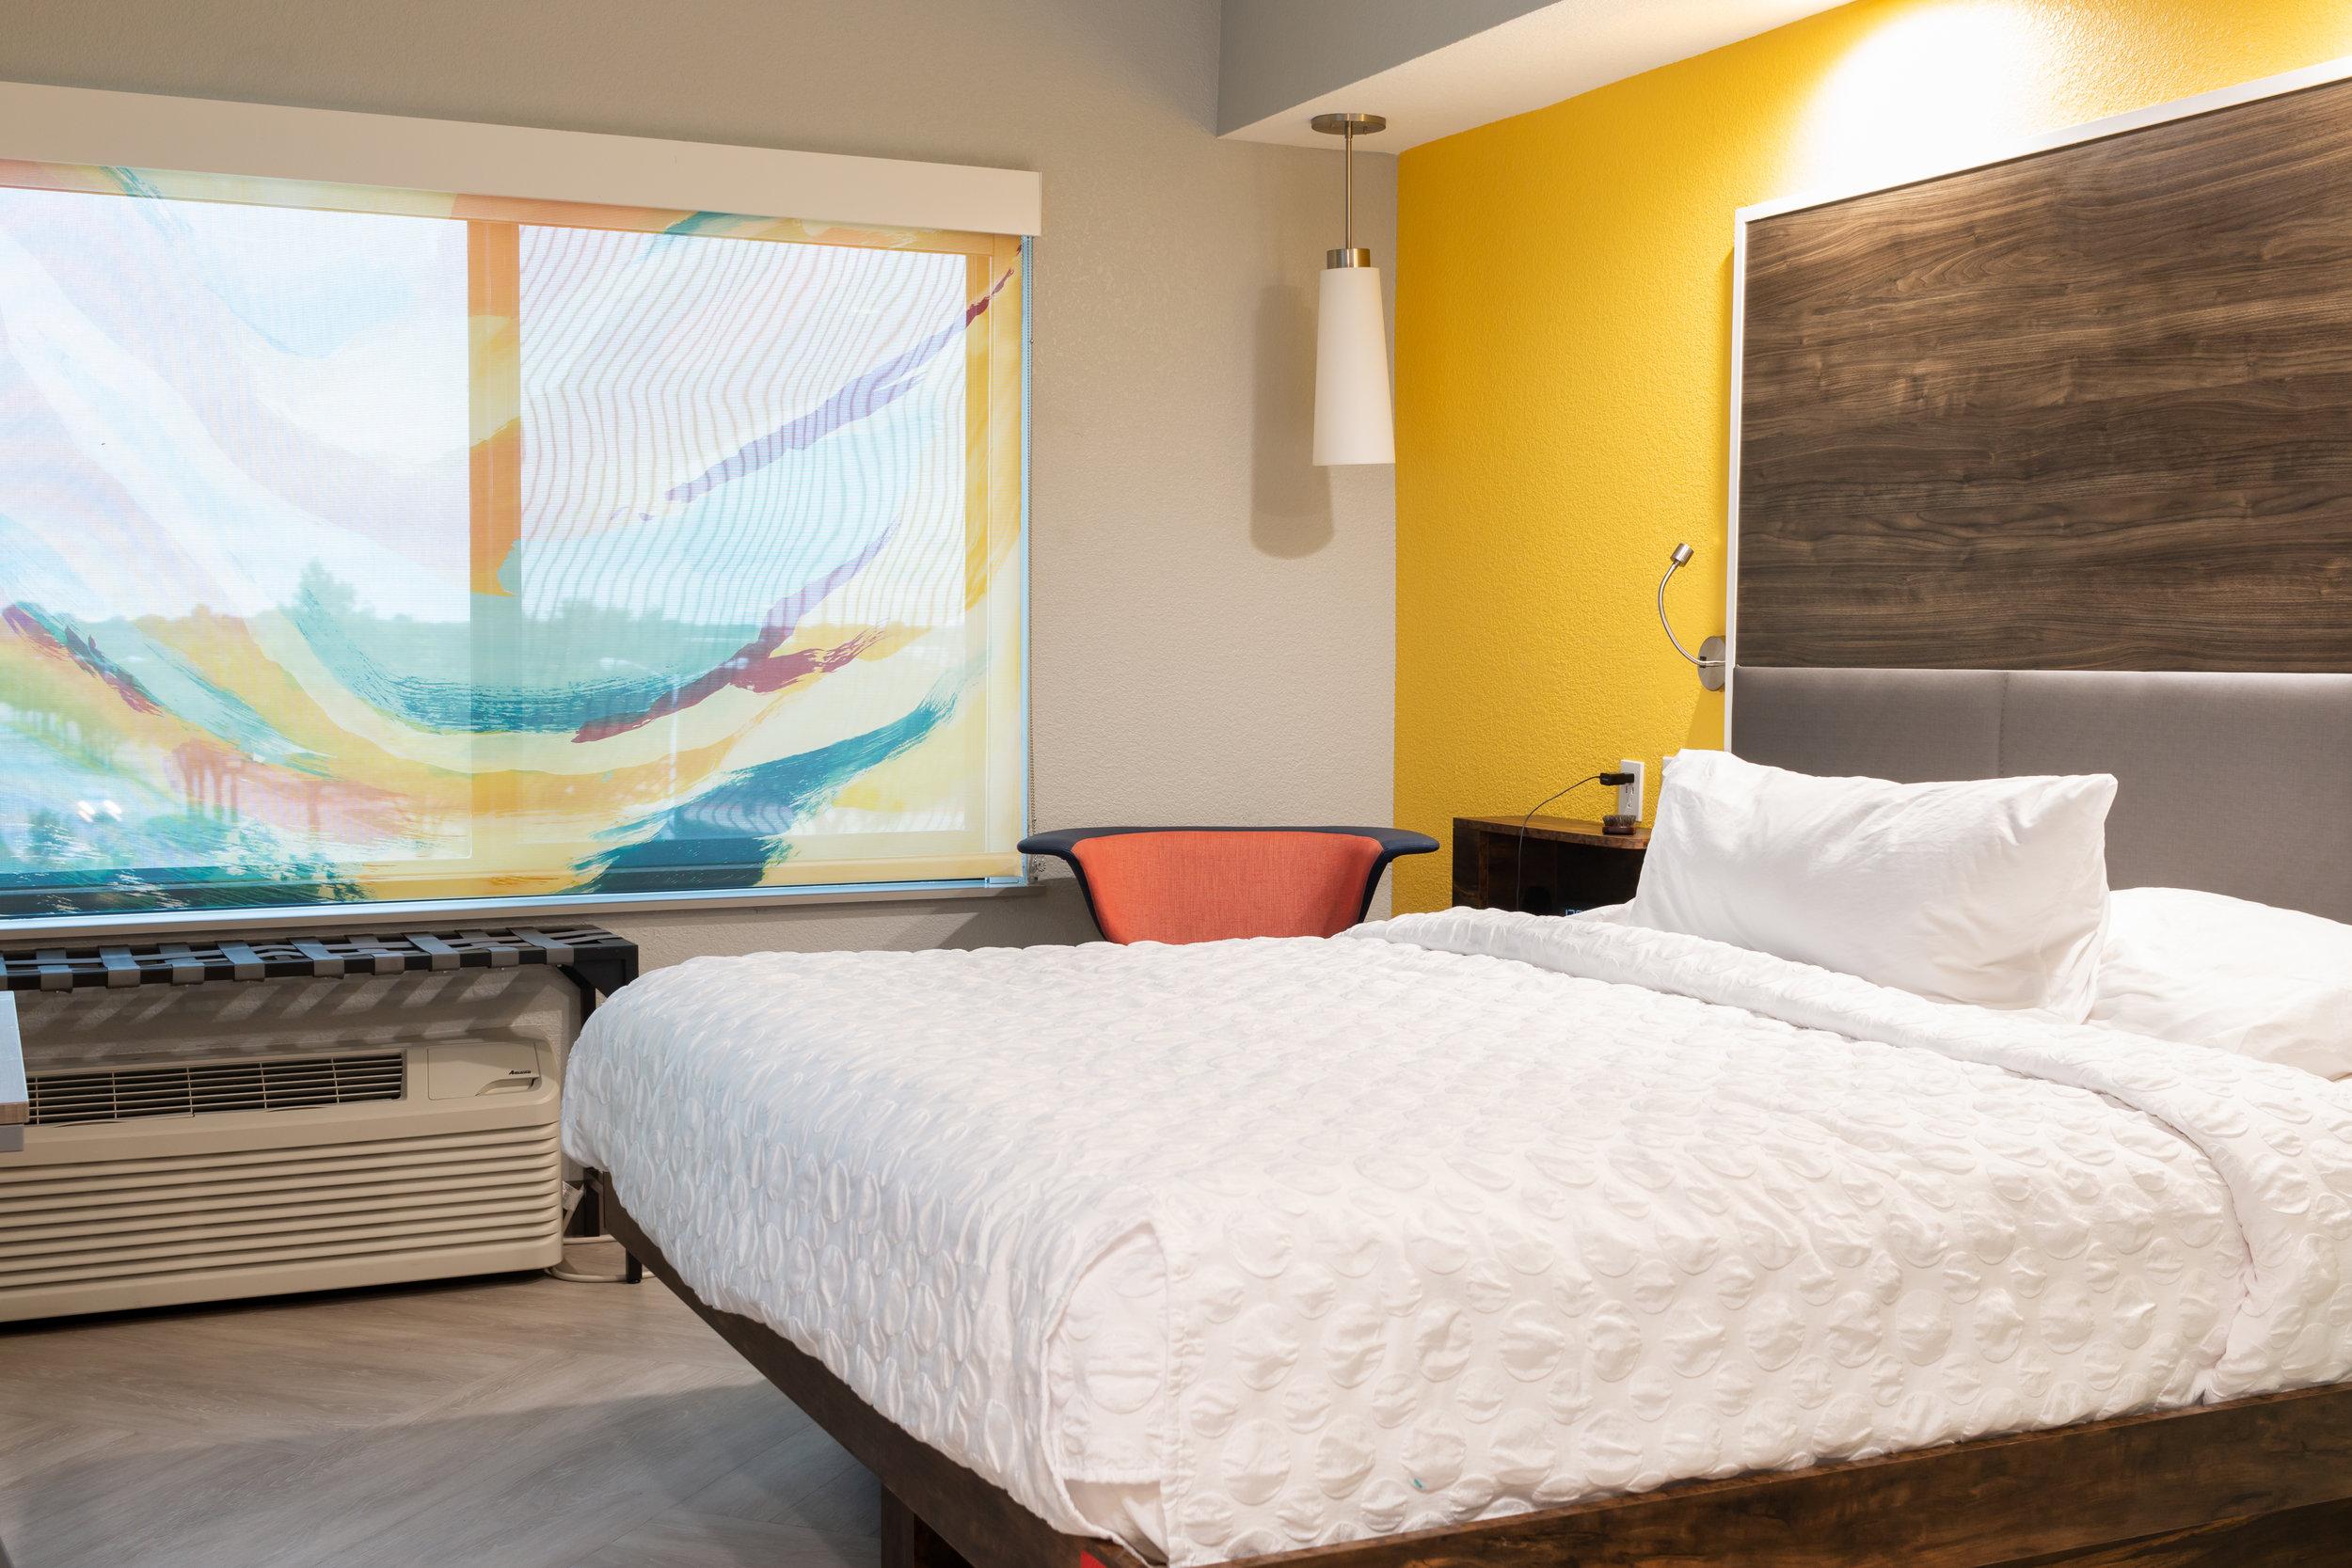 tru-by-hilton-richardson-garland-accomodations-hotel-review